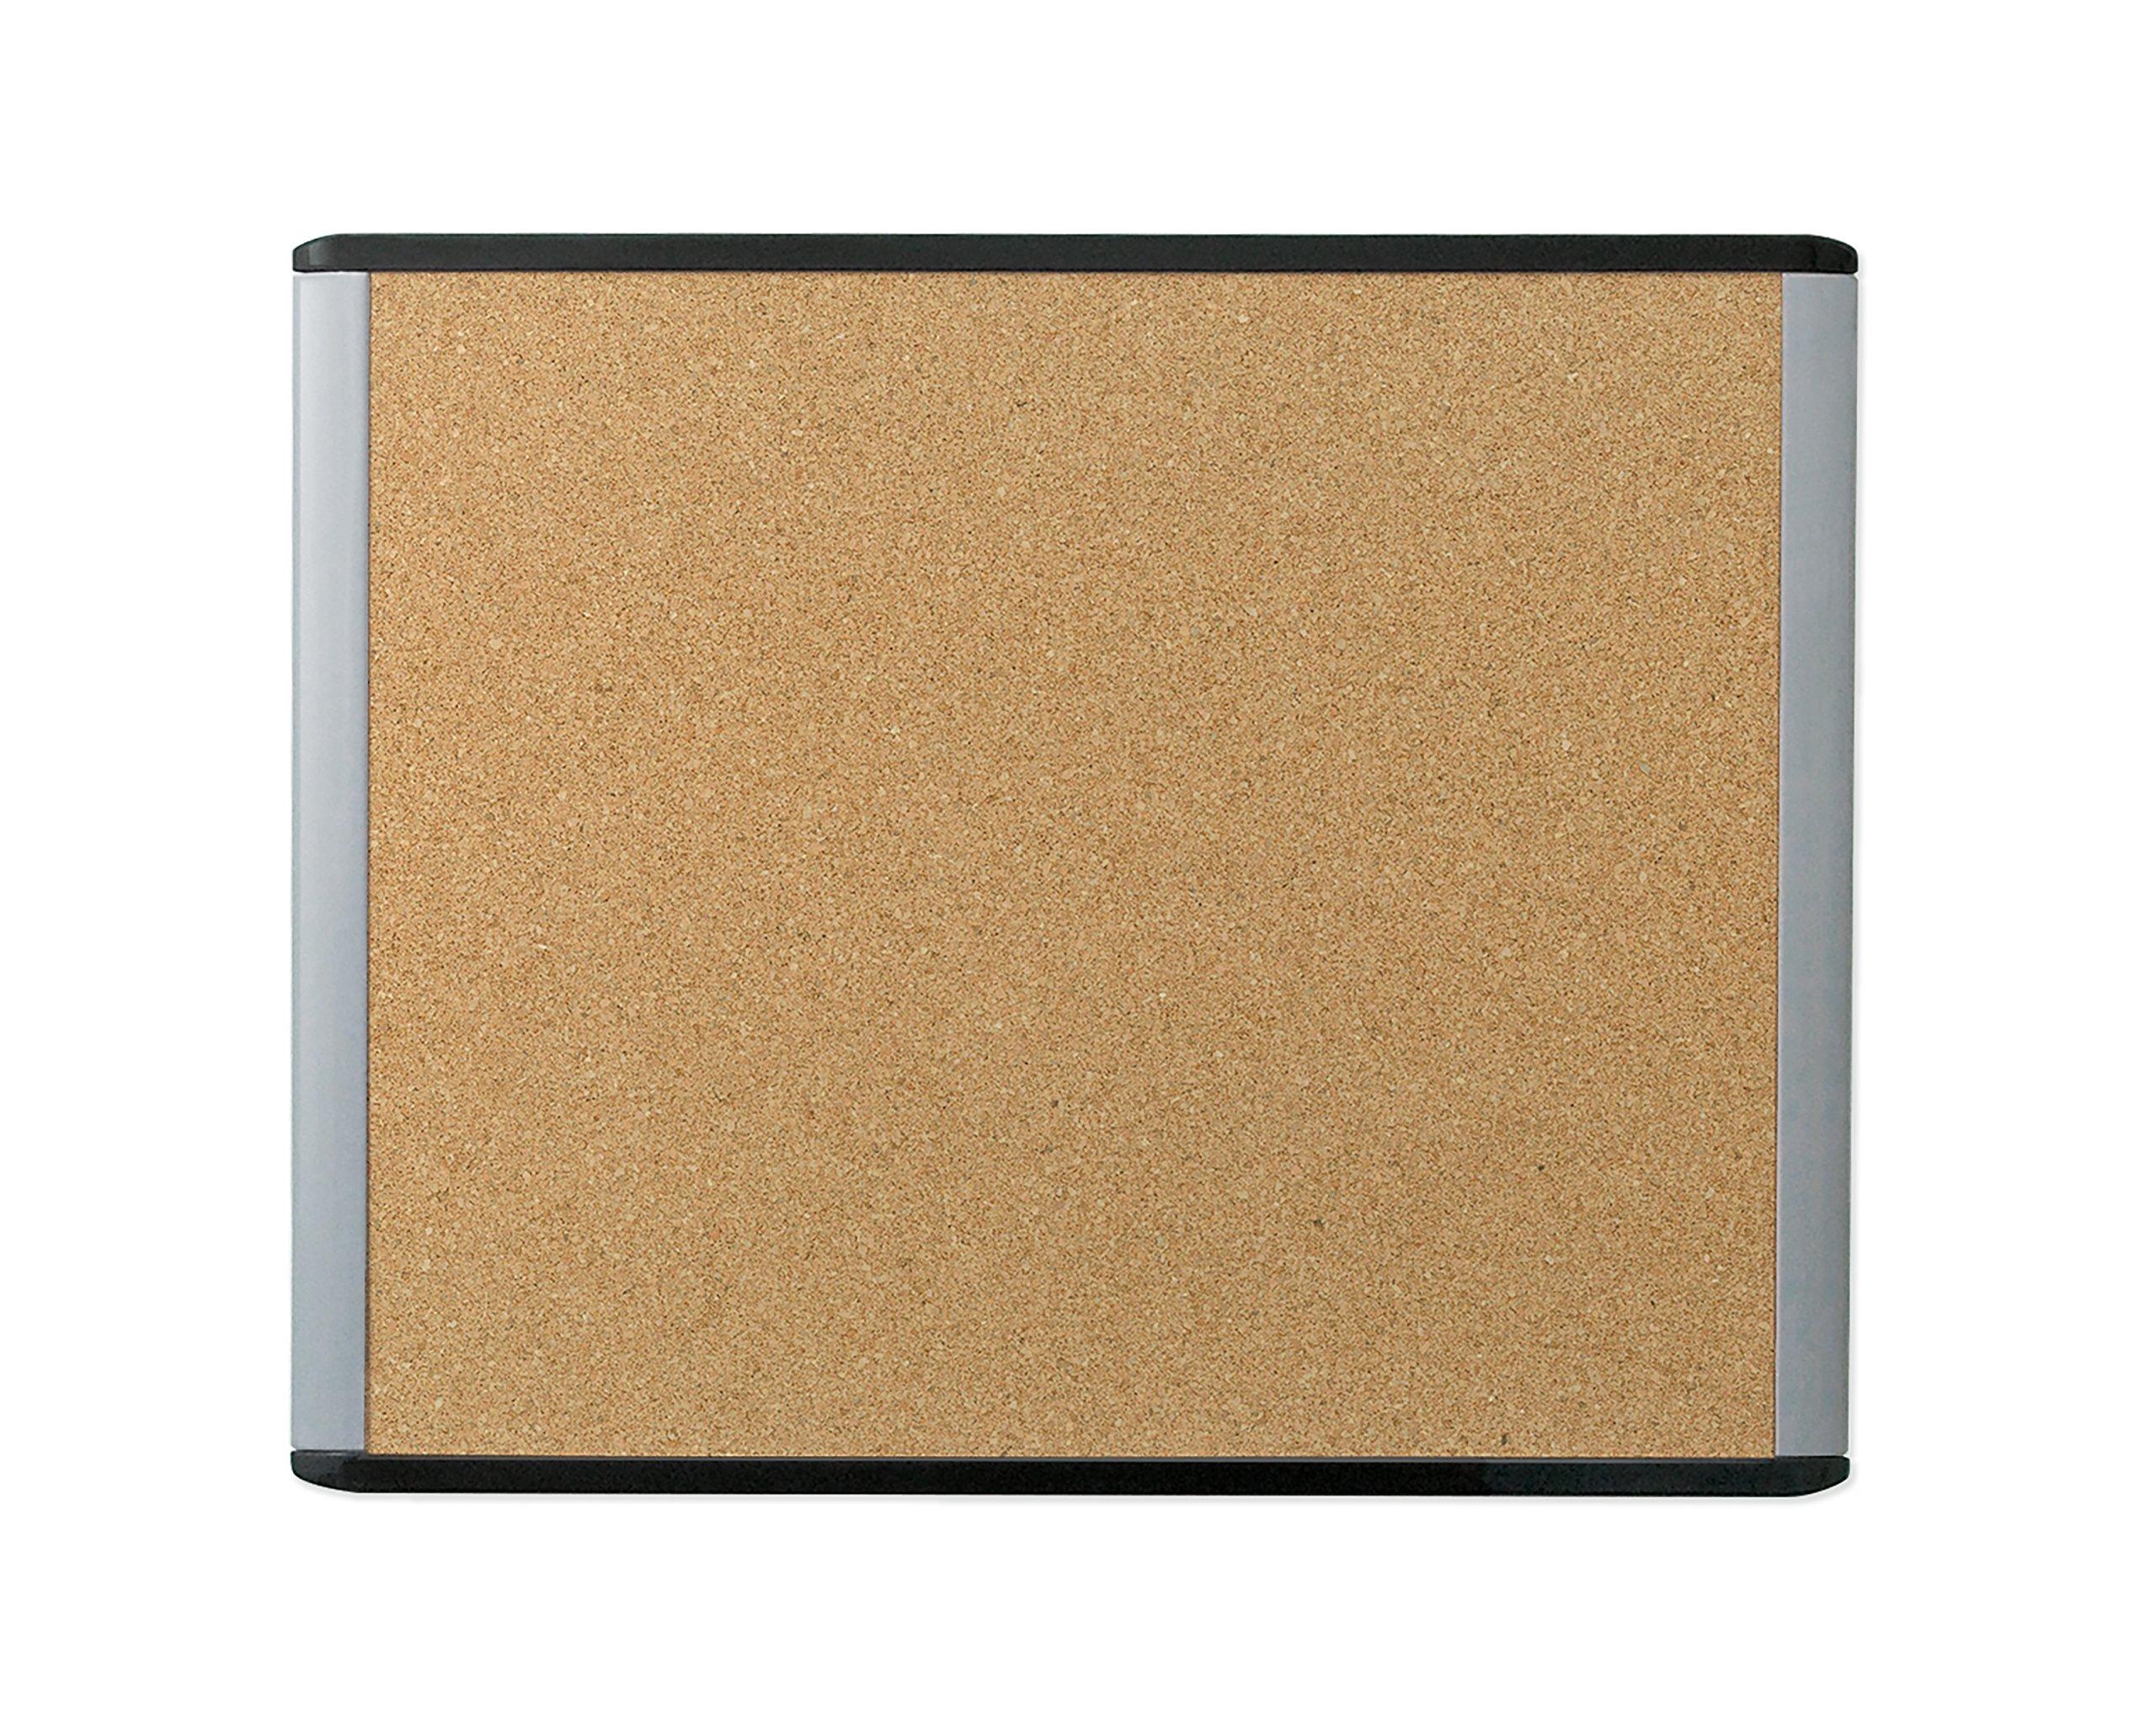 U Brands MOD Cork Bulletin Board, 20 x 16 Inches, Black and Grey Frame